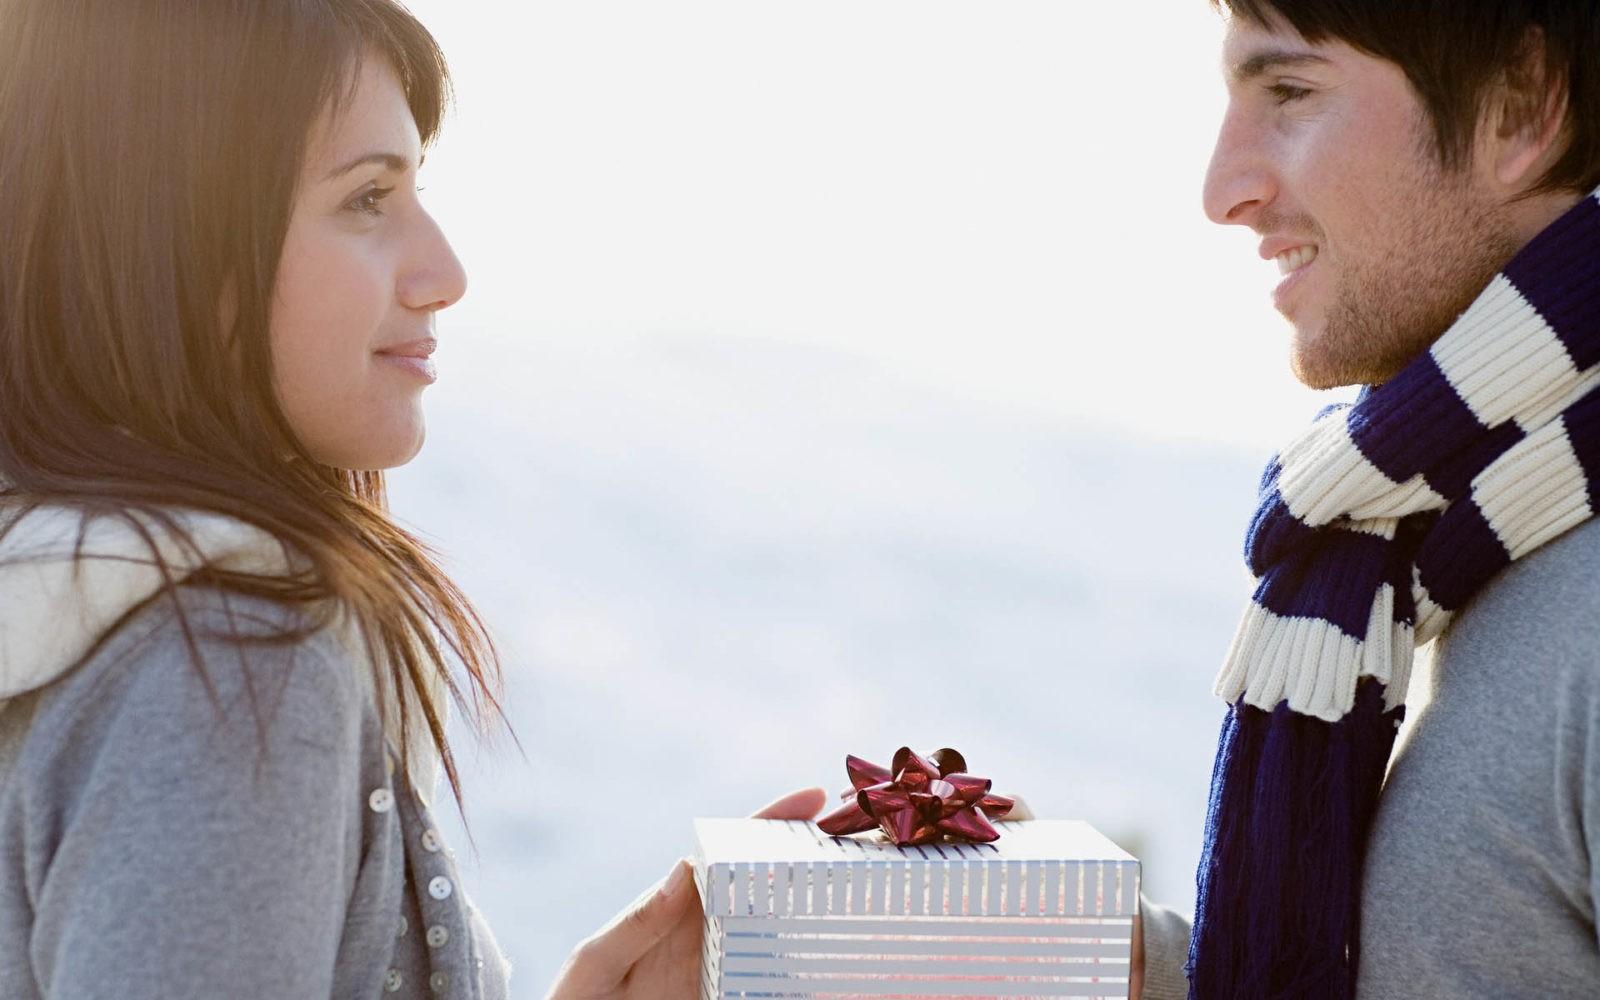 девушка дарит подарок мужчине